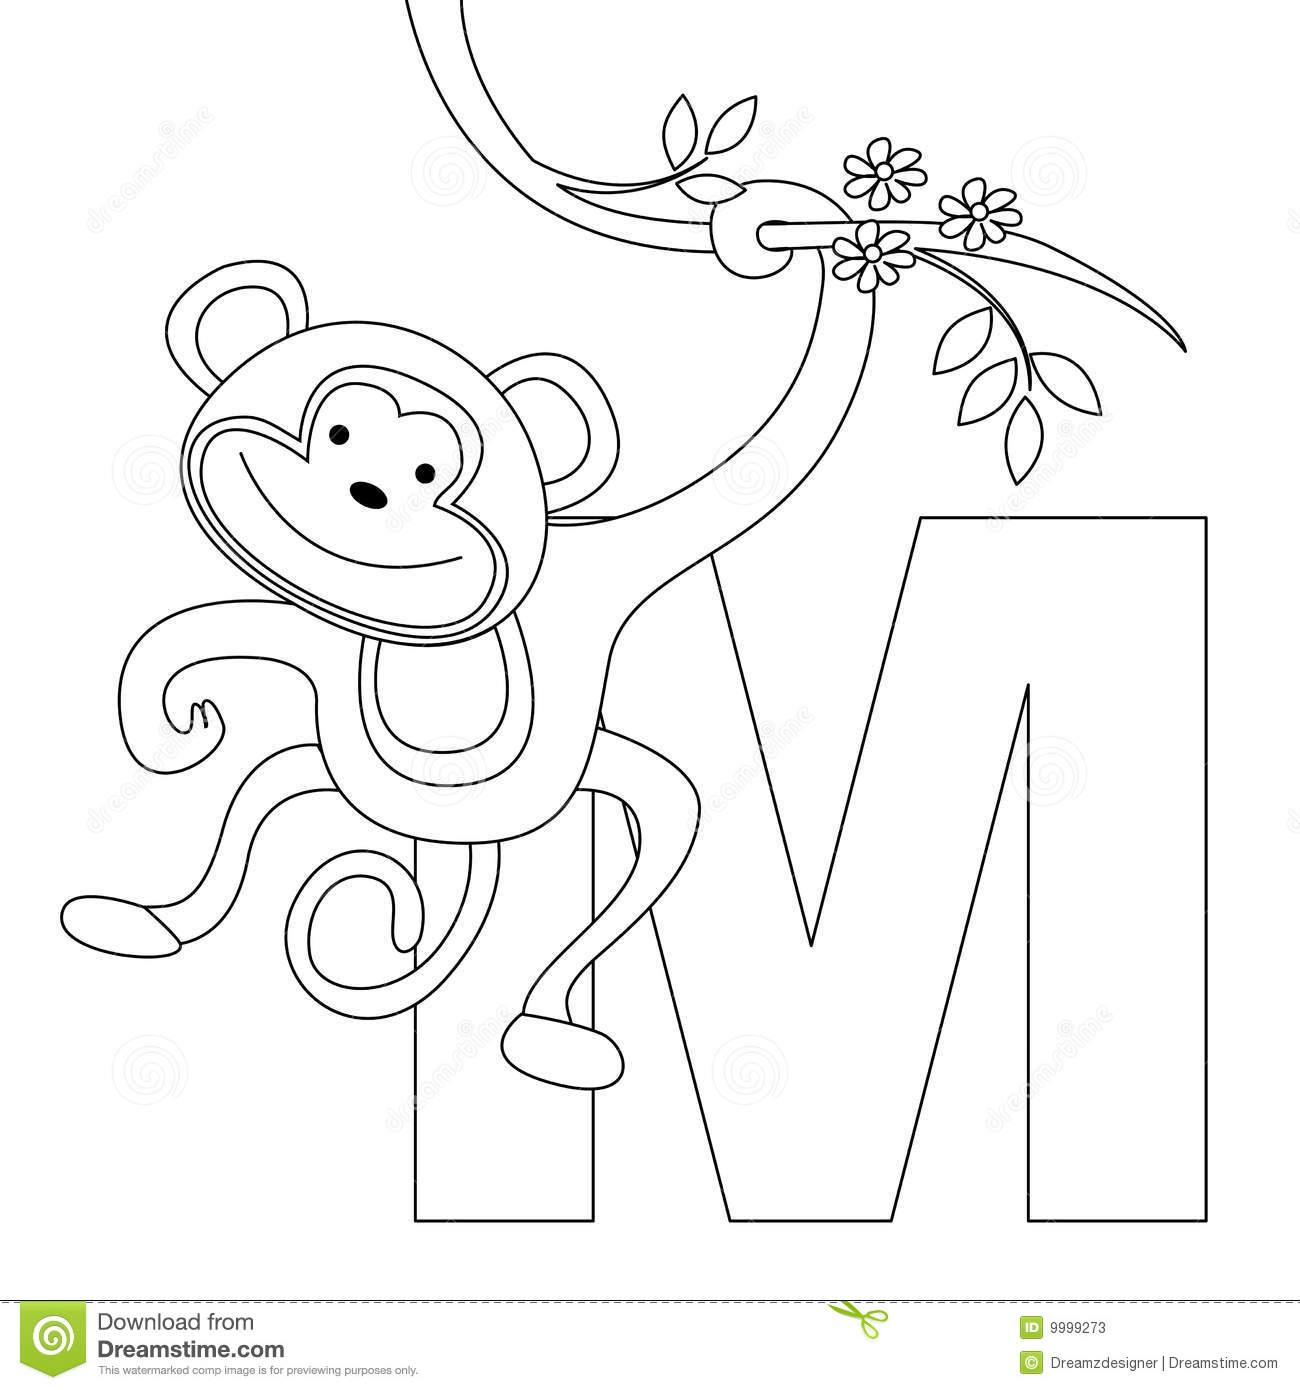 m preschool coloring pages - photo#3